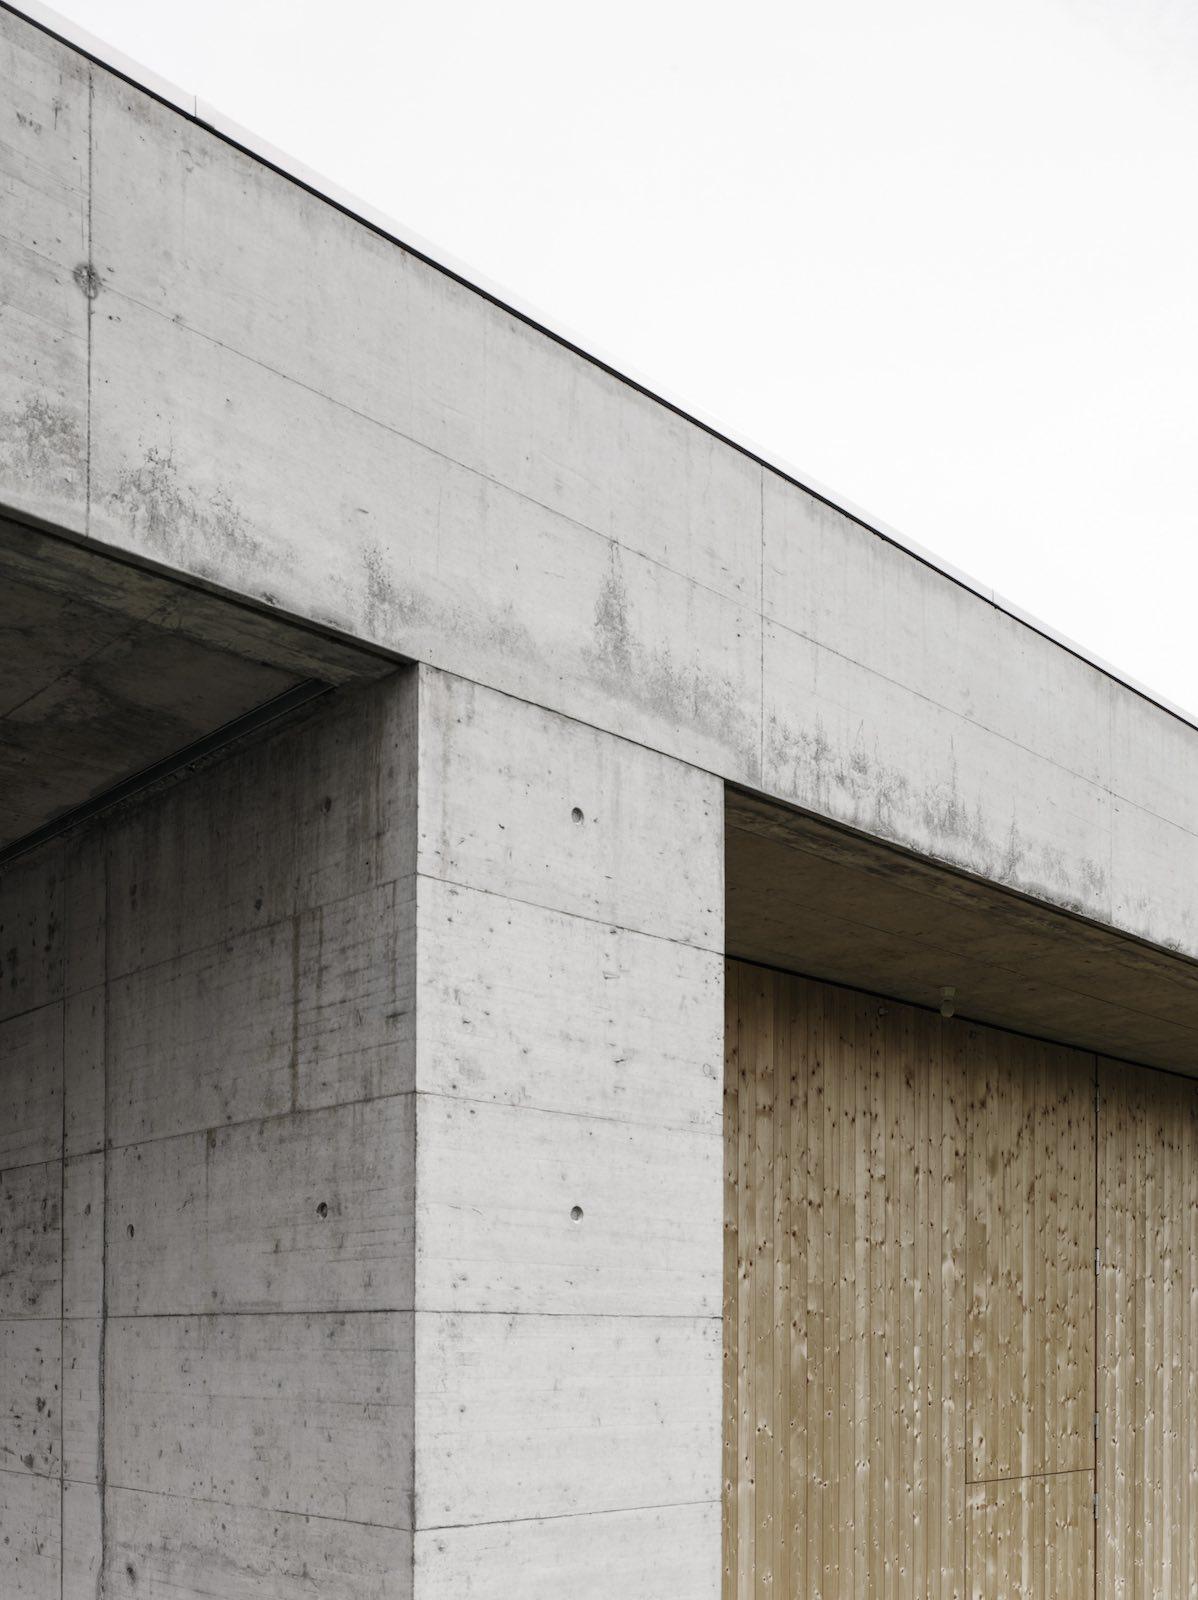 Architecture_GrissEquineVeterinaryPractice_Marte.MarteArchitects_08